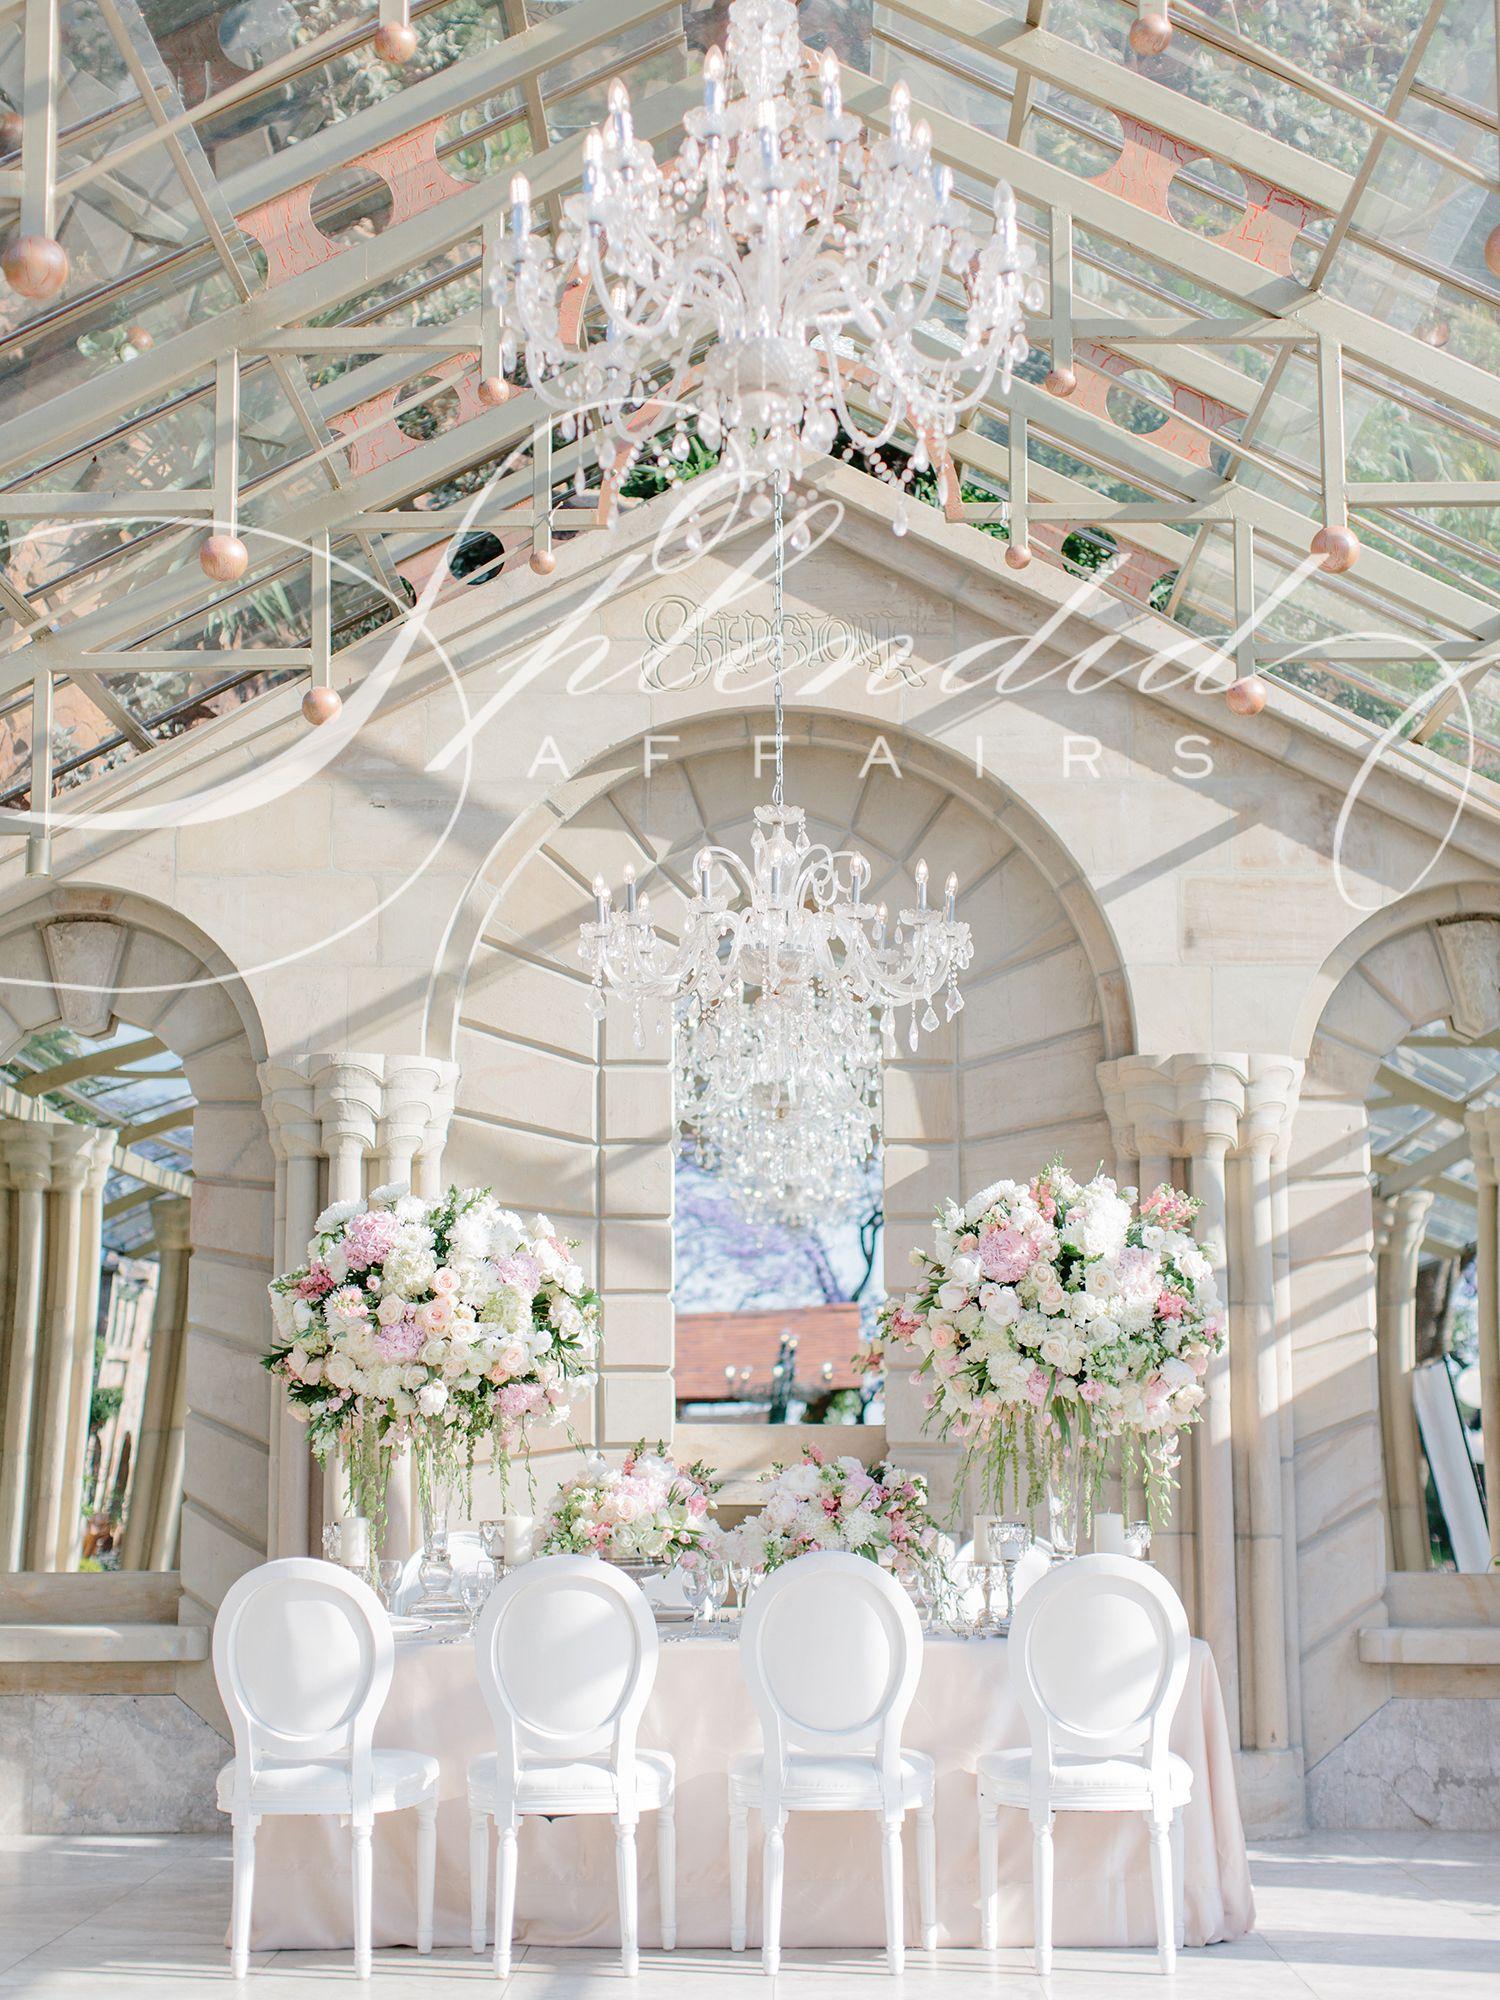 Wedding Company Blush Weddings Table Settings Decorations Colours Dream Gardens Blushes Children